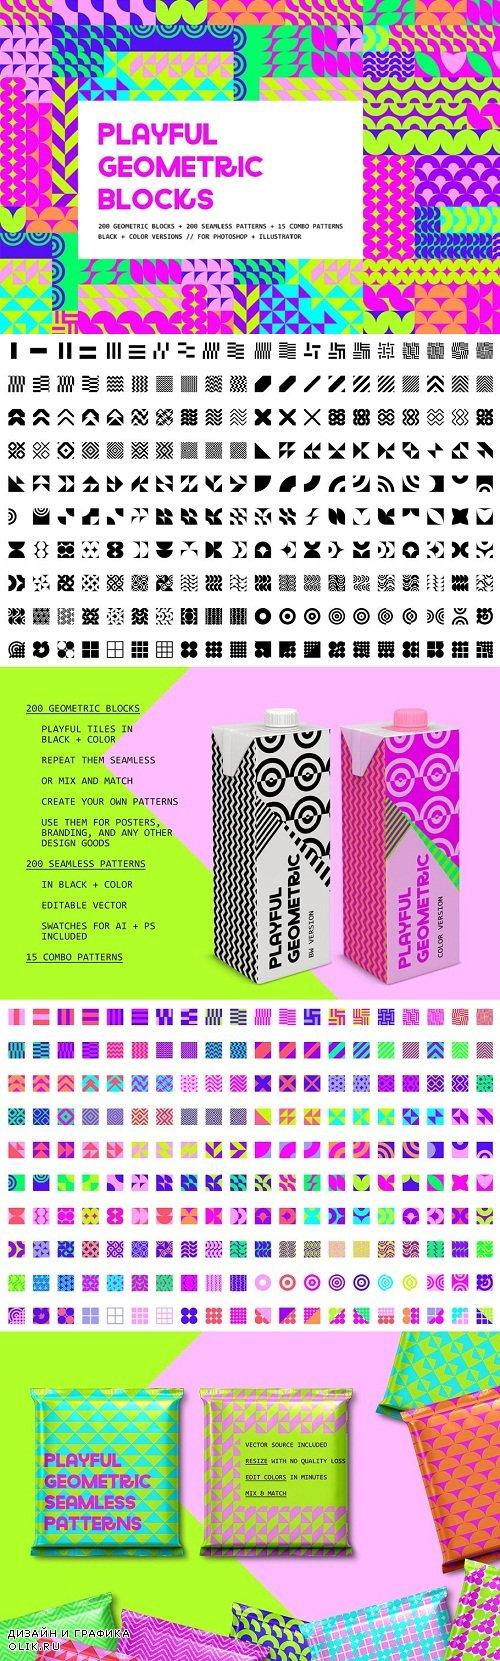 Playful Geometric Blocks - 3515803